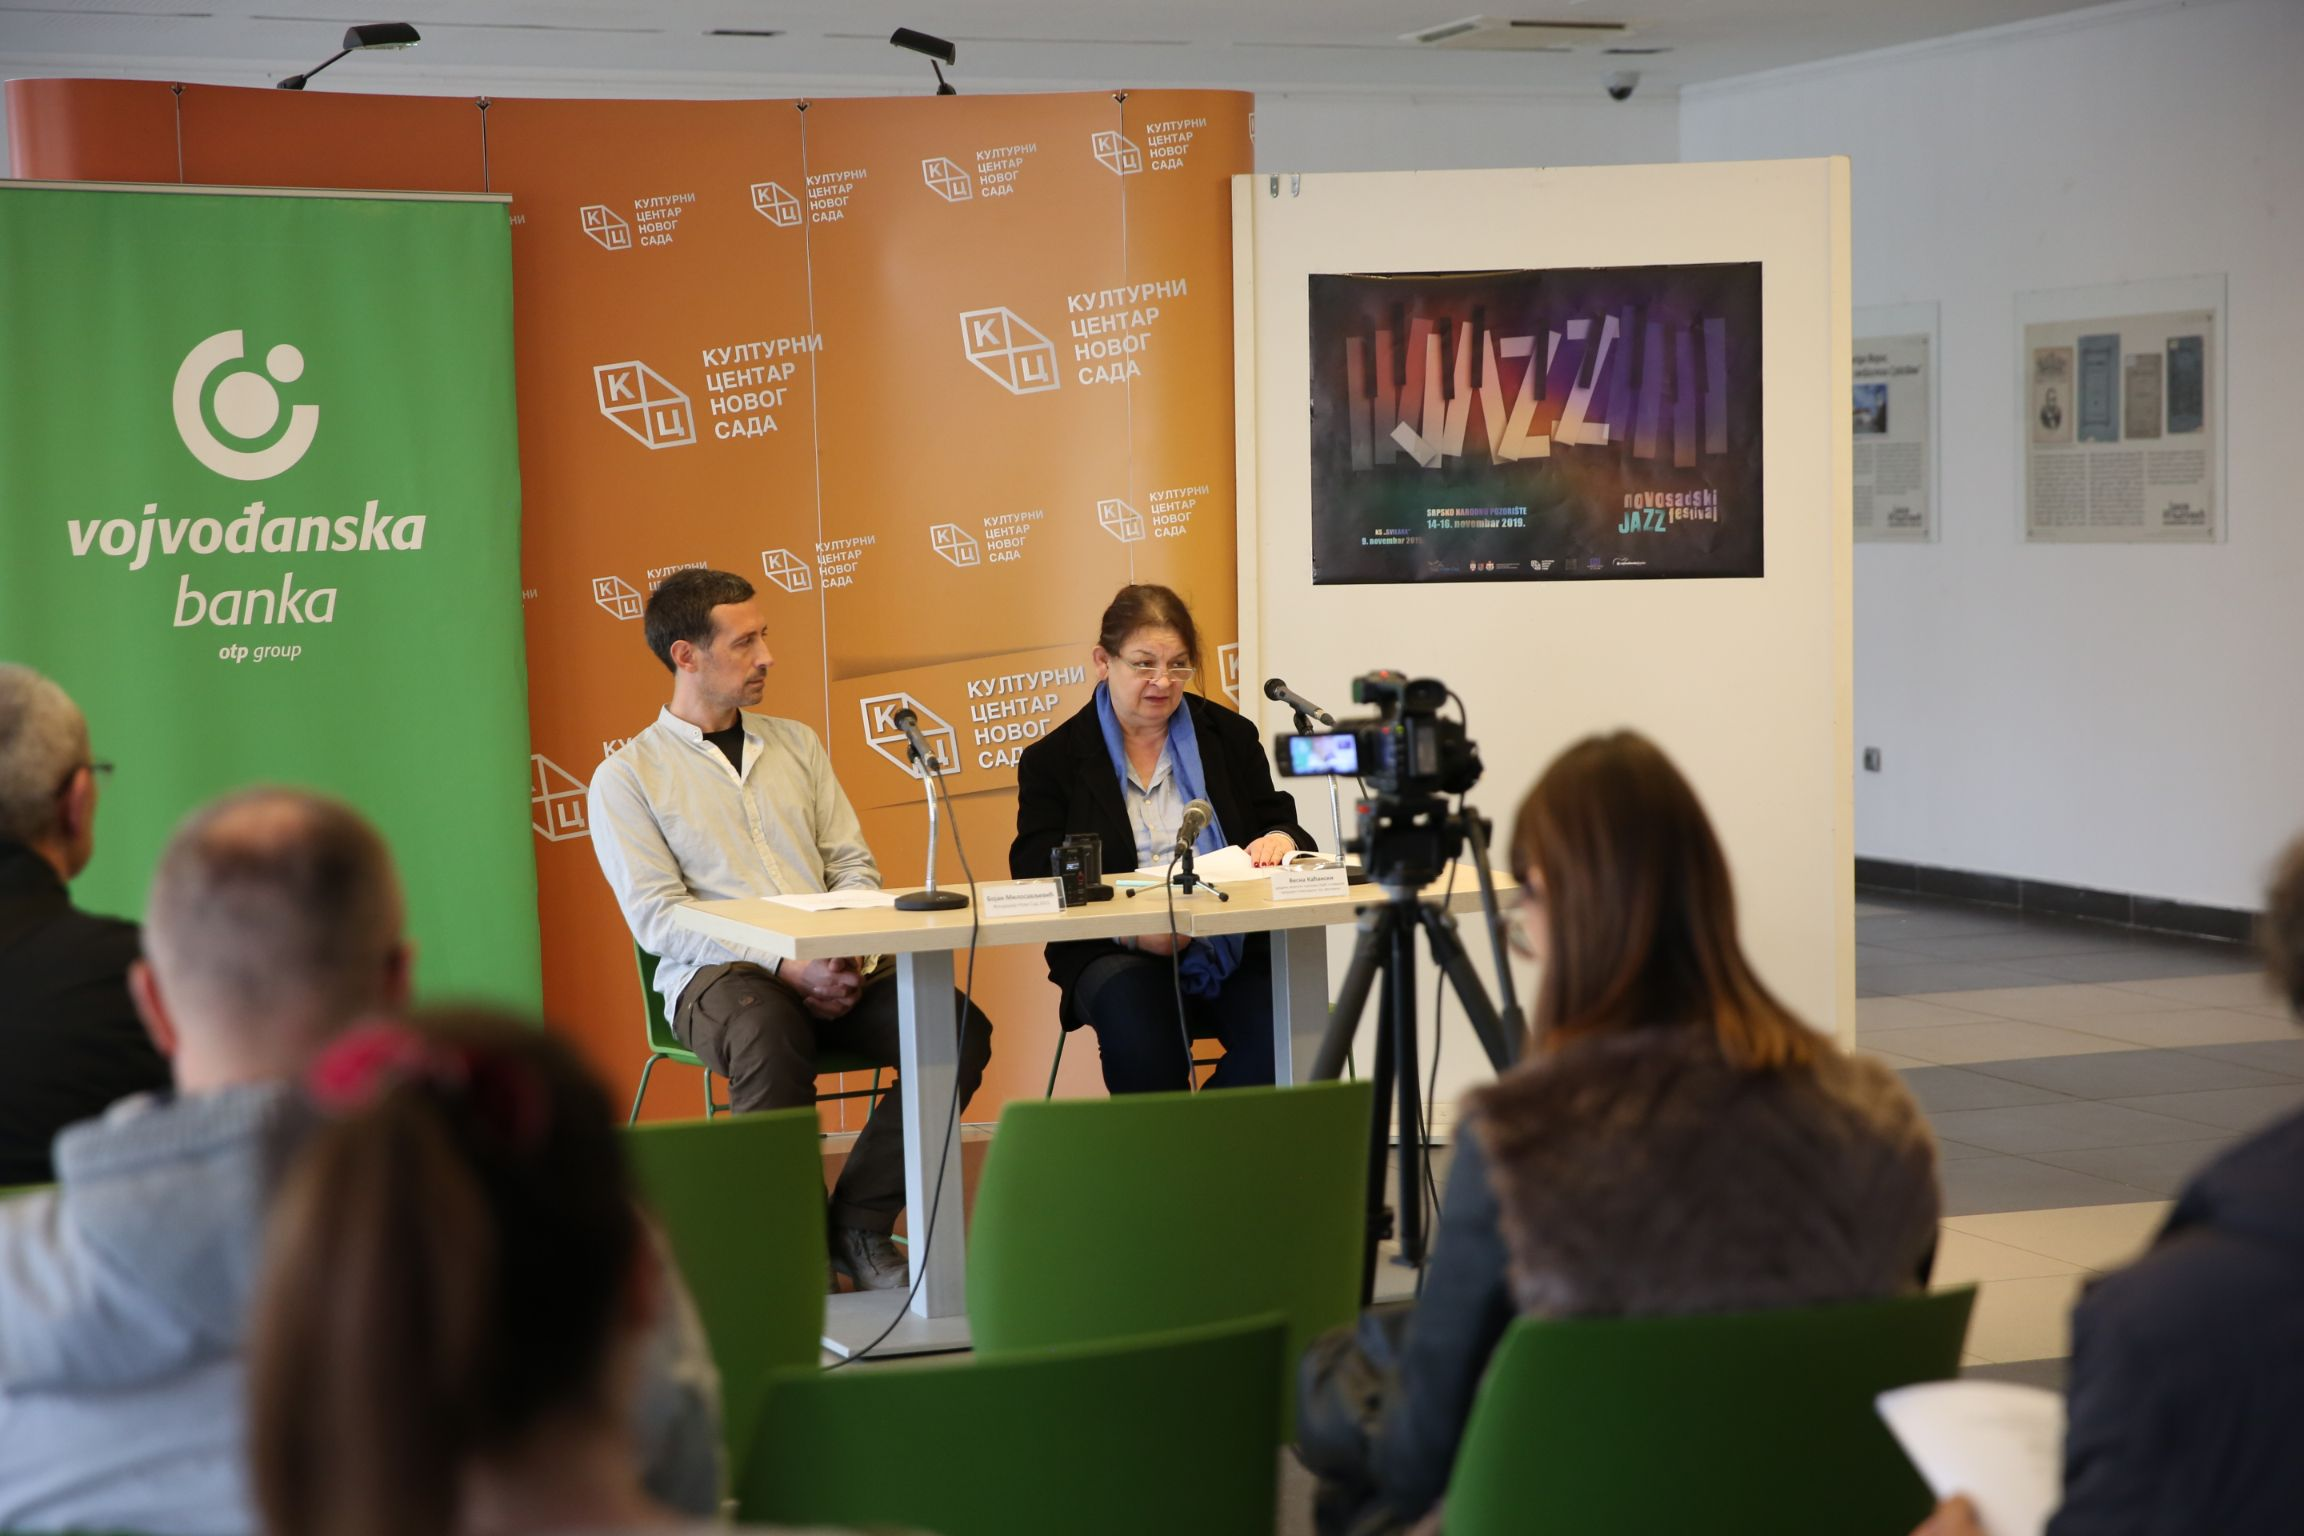 Ускоро почиње 21. Новосадски џез фестивал